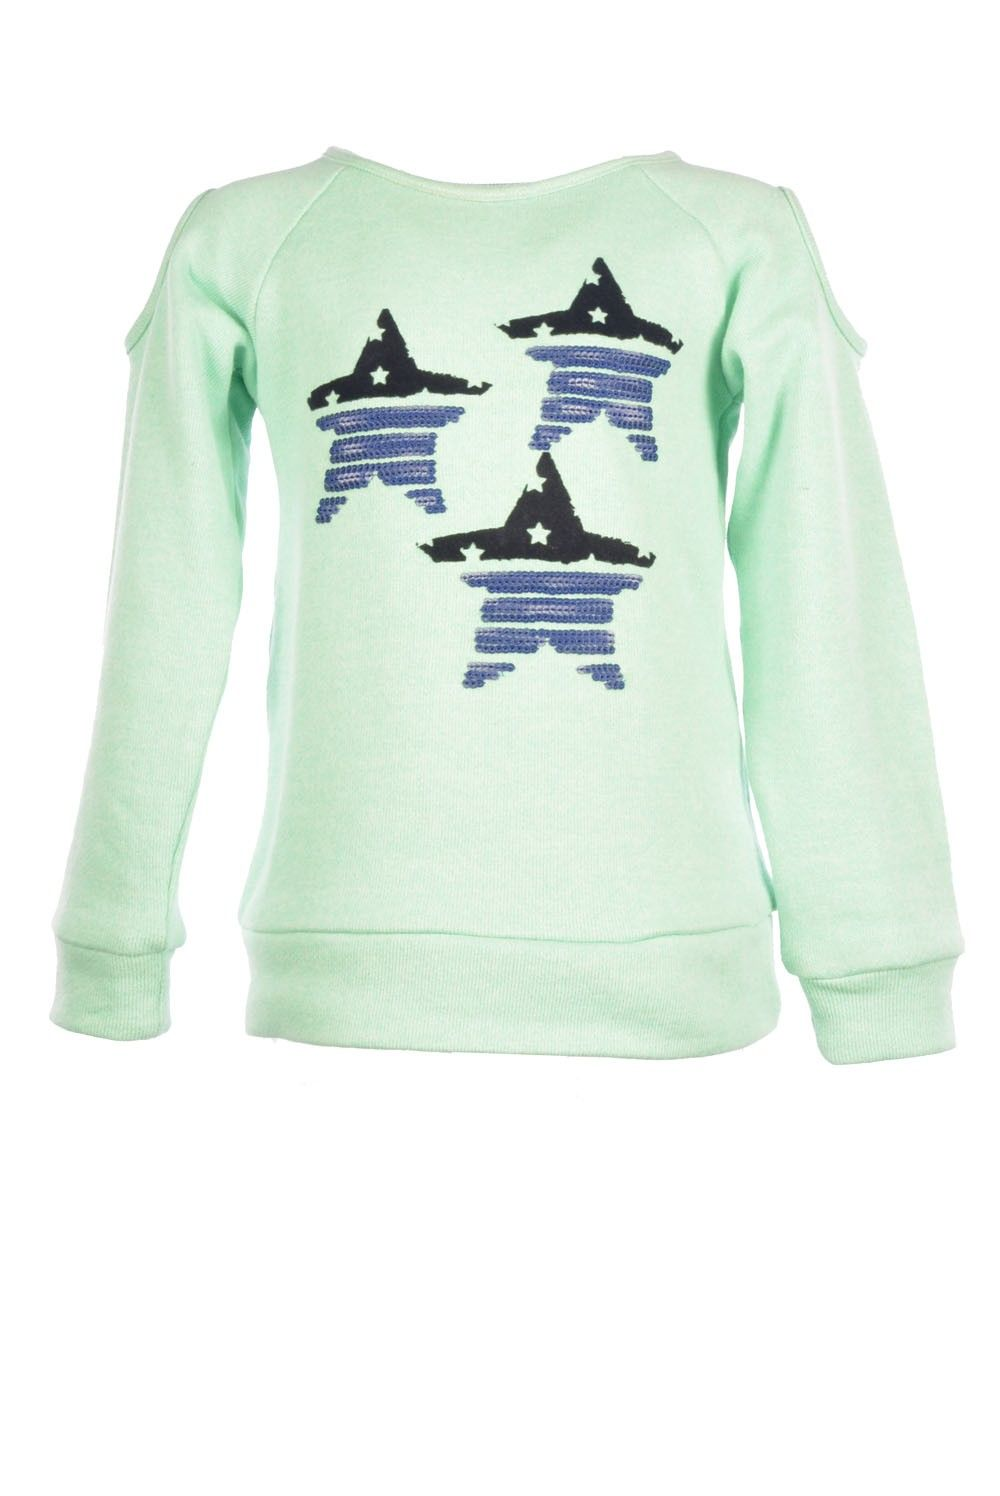 Dress like Flo Girls Holly sweater mint